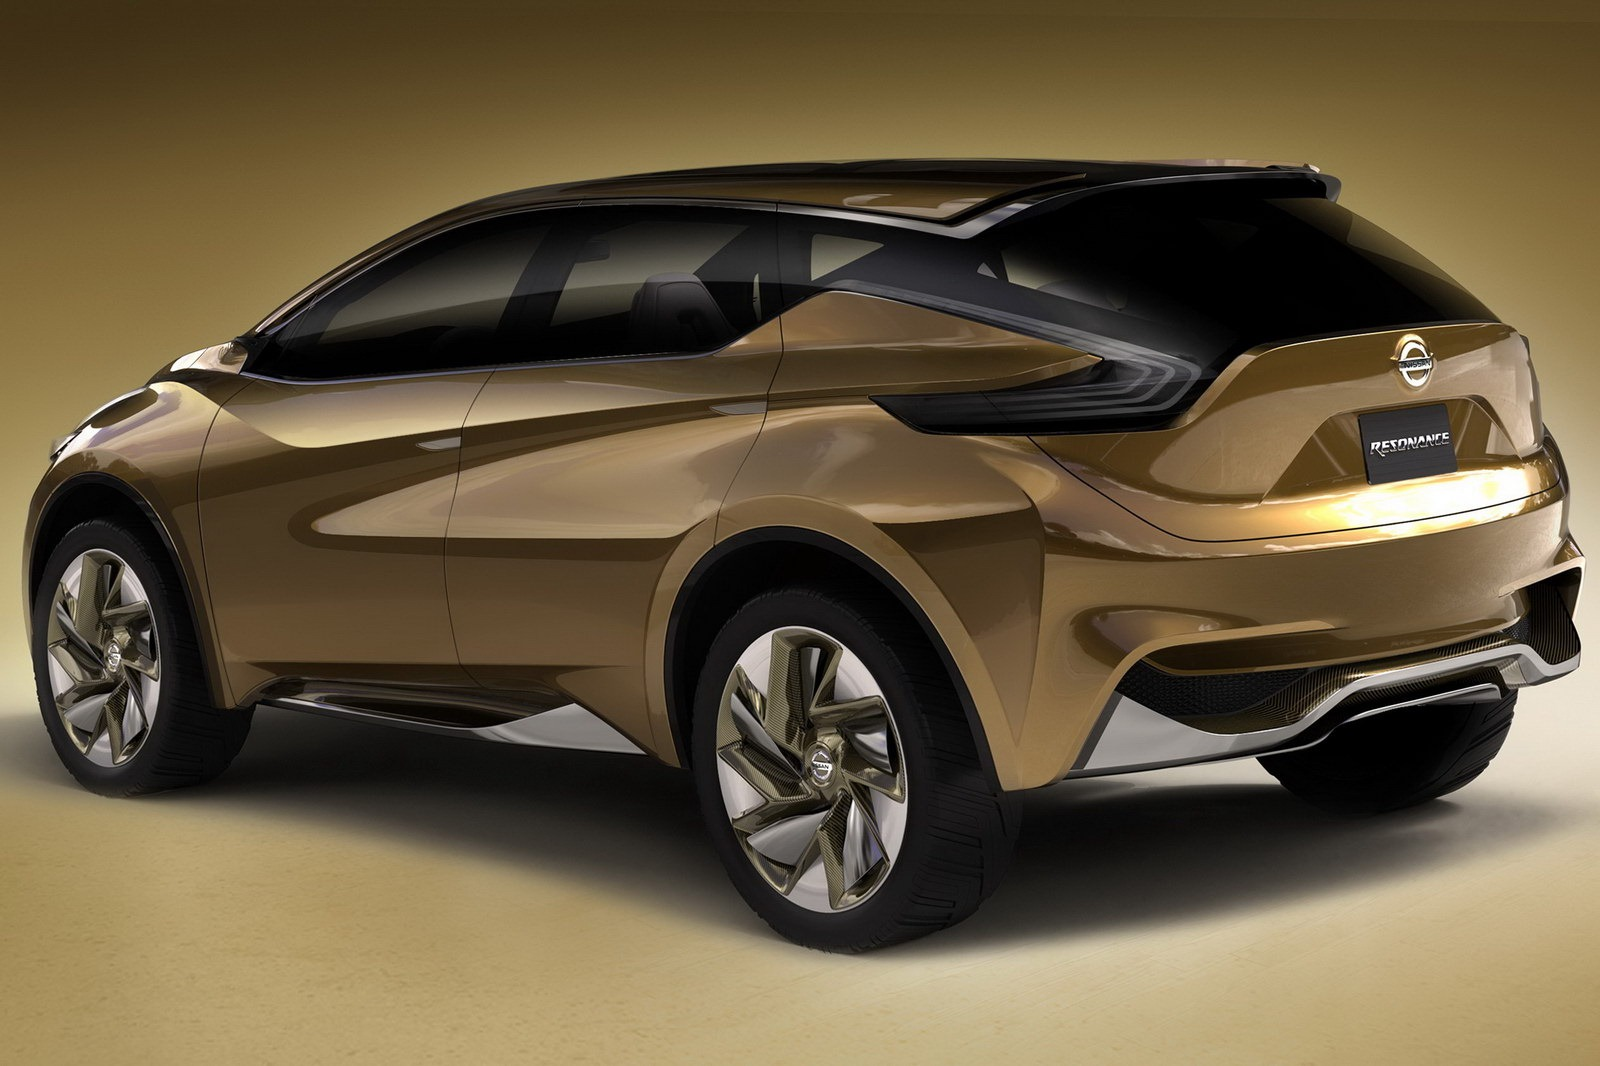 2017 Nissan Murano Concept Release Date